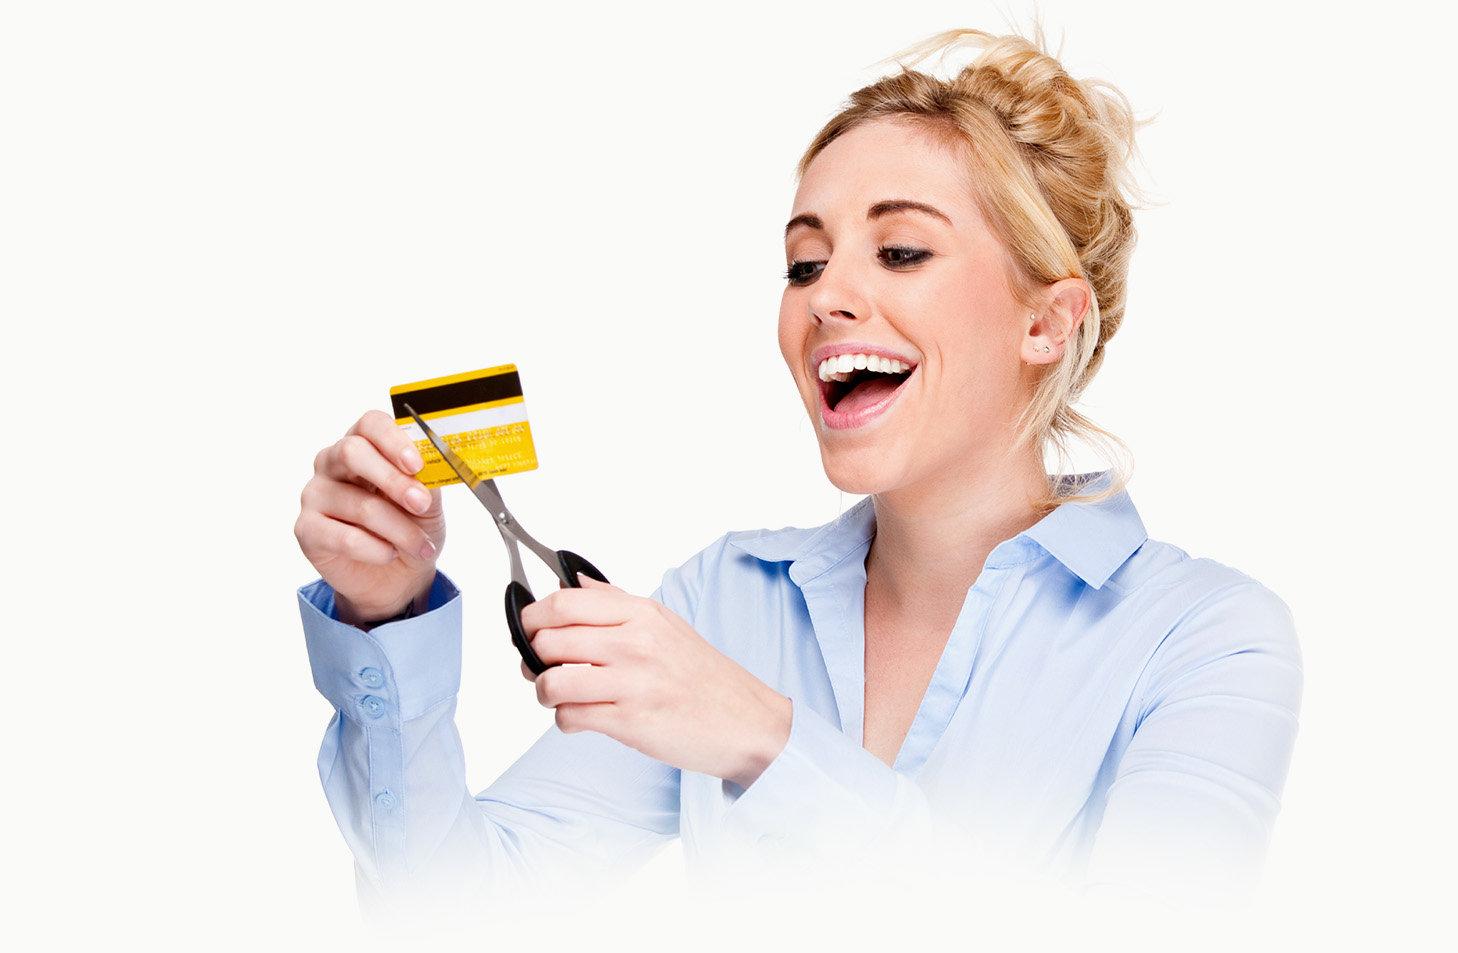 Просрочка по кредиту 3 месяца